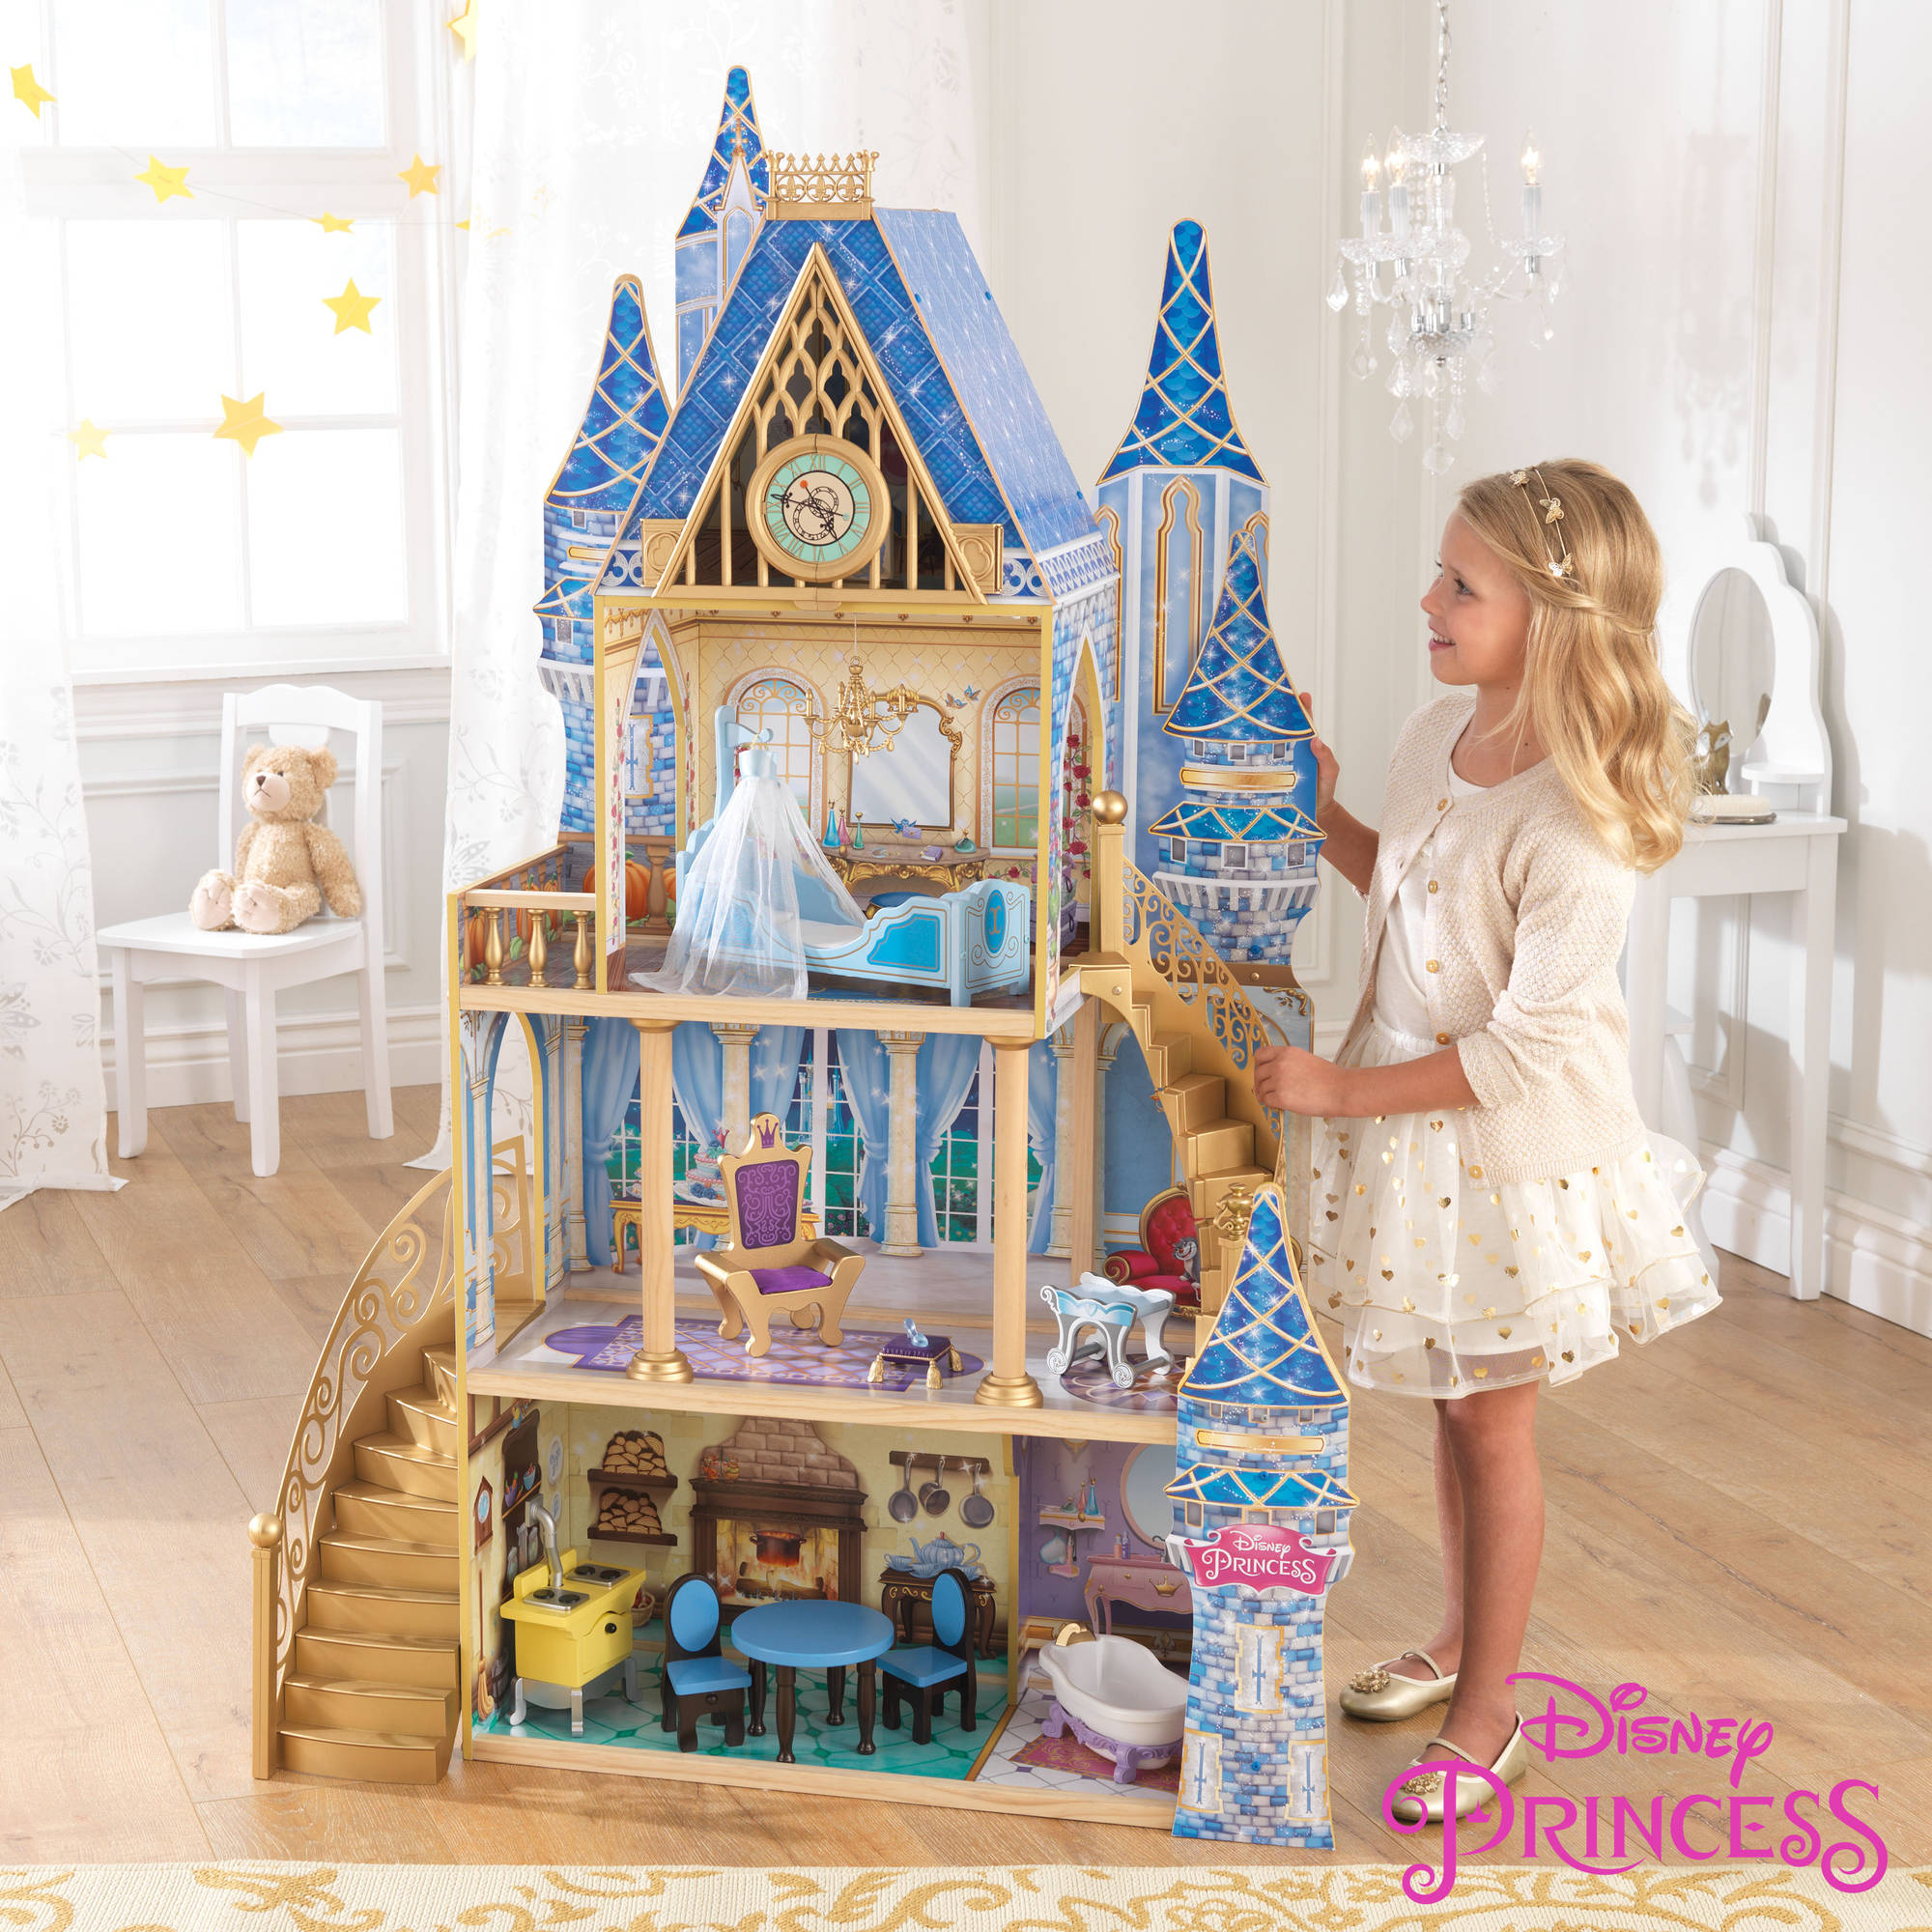 Beautiful Castle Dollhouse Furniture #11: Disney Princess Cinderella Royal Dreams Dollhouse With Furniture By  KidKraft - Walmart.com